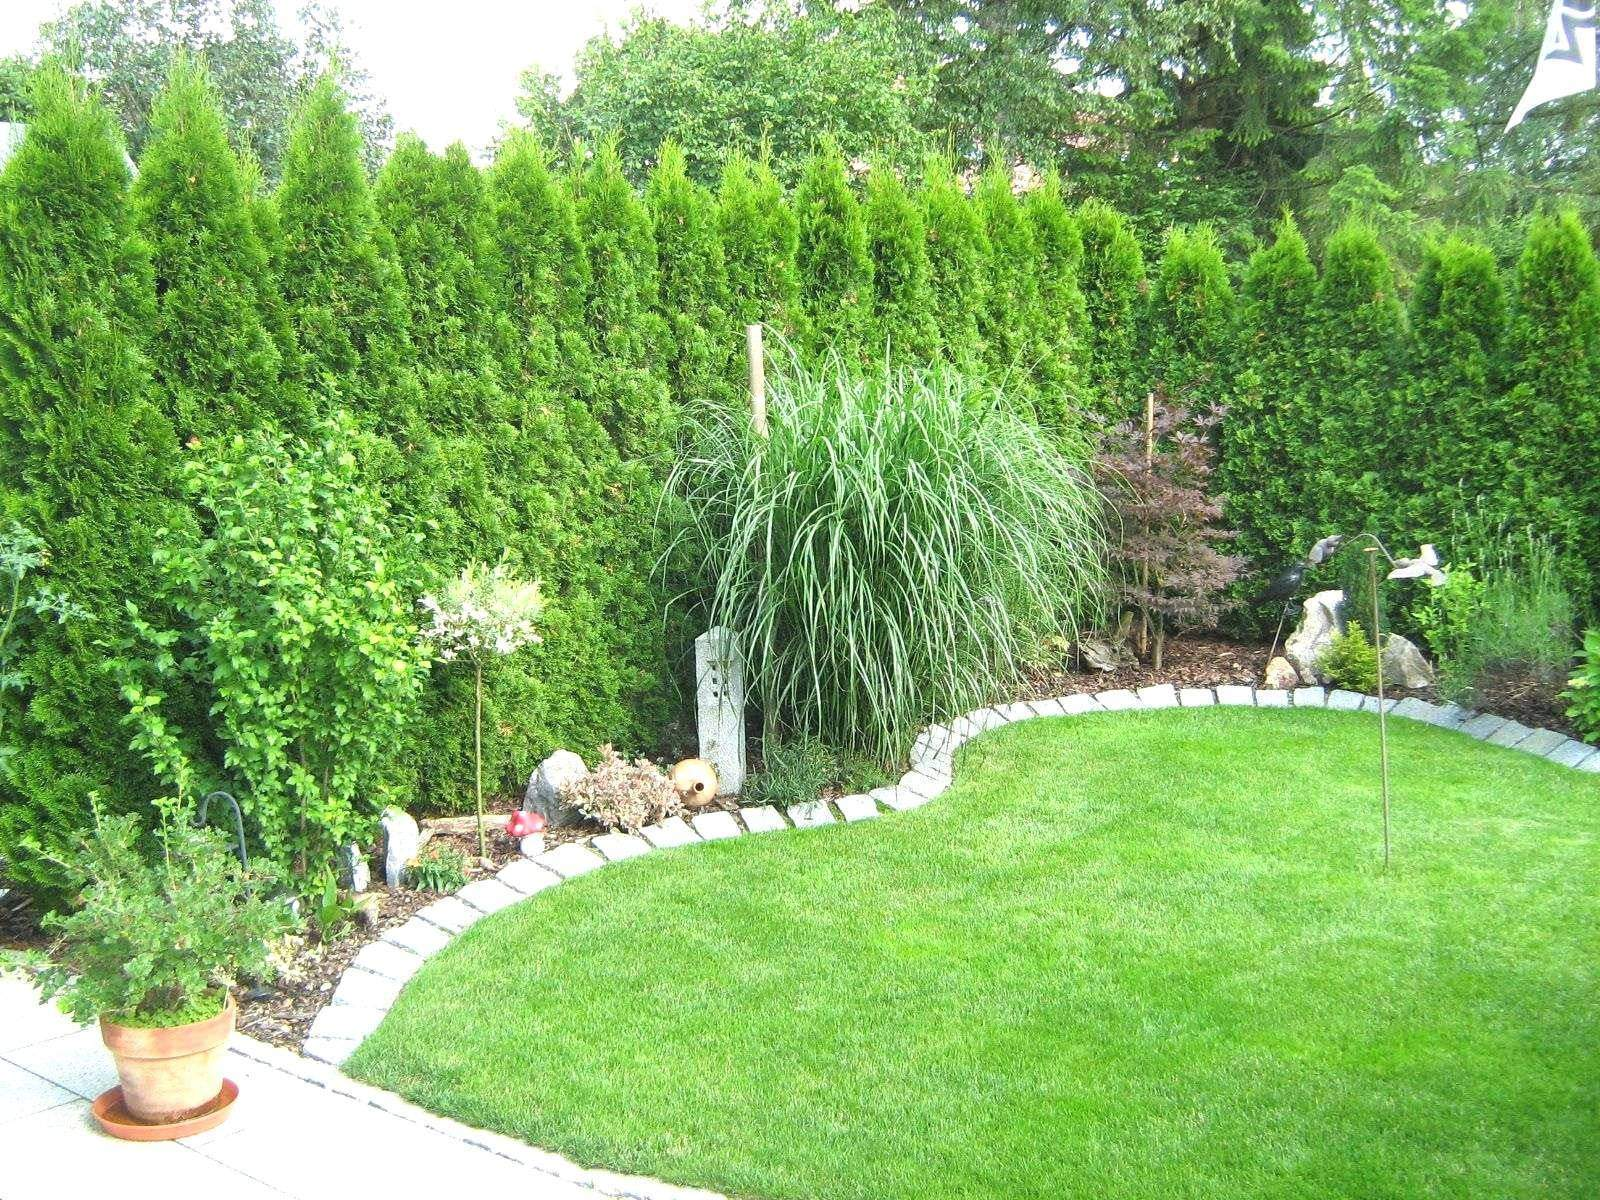 Asiatischer Garten Genial 27 Reizend Hangsicherung Garten Luxus